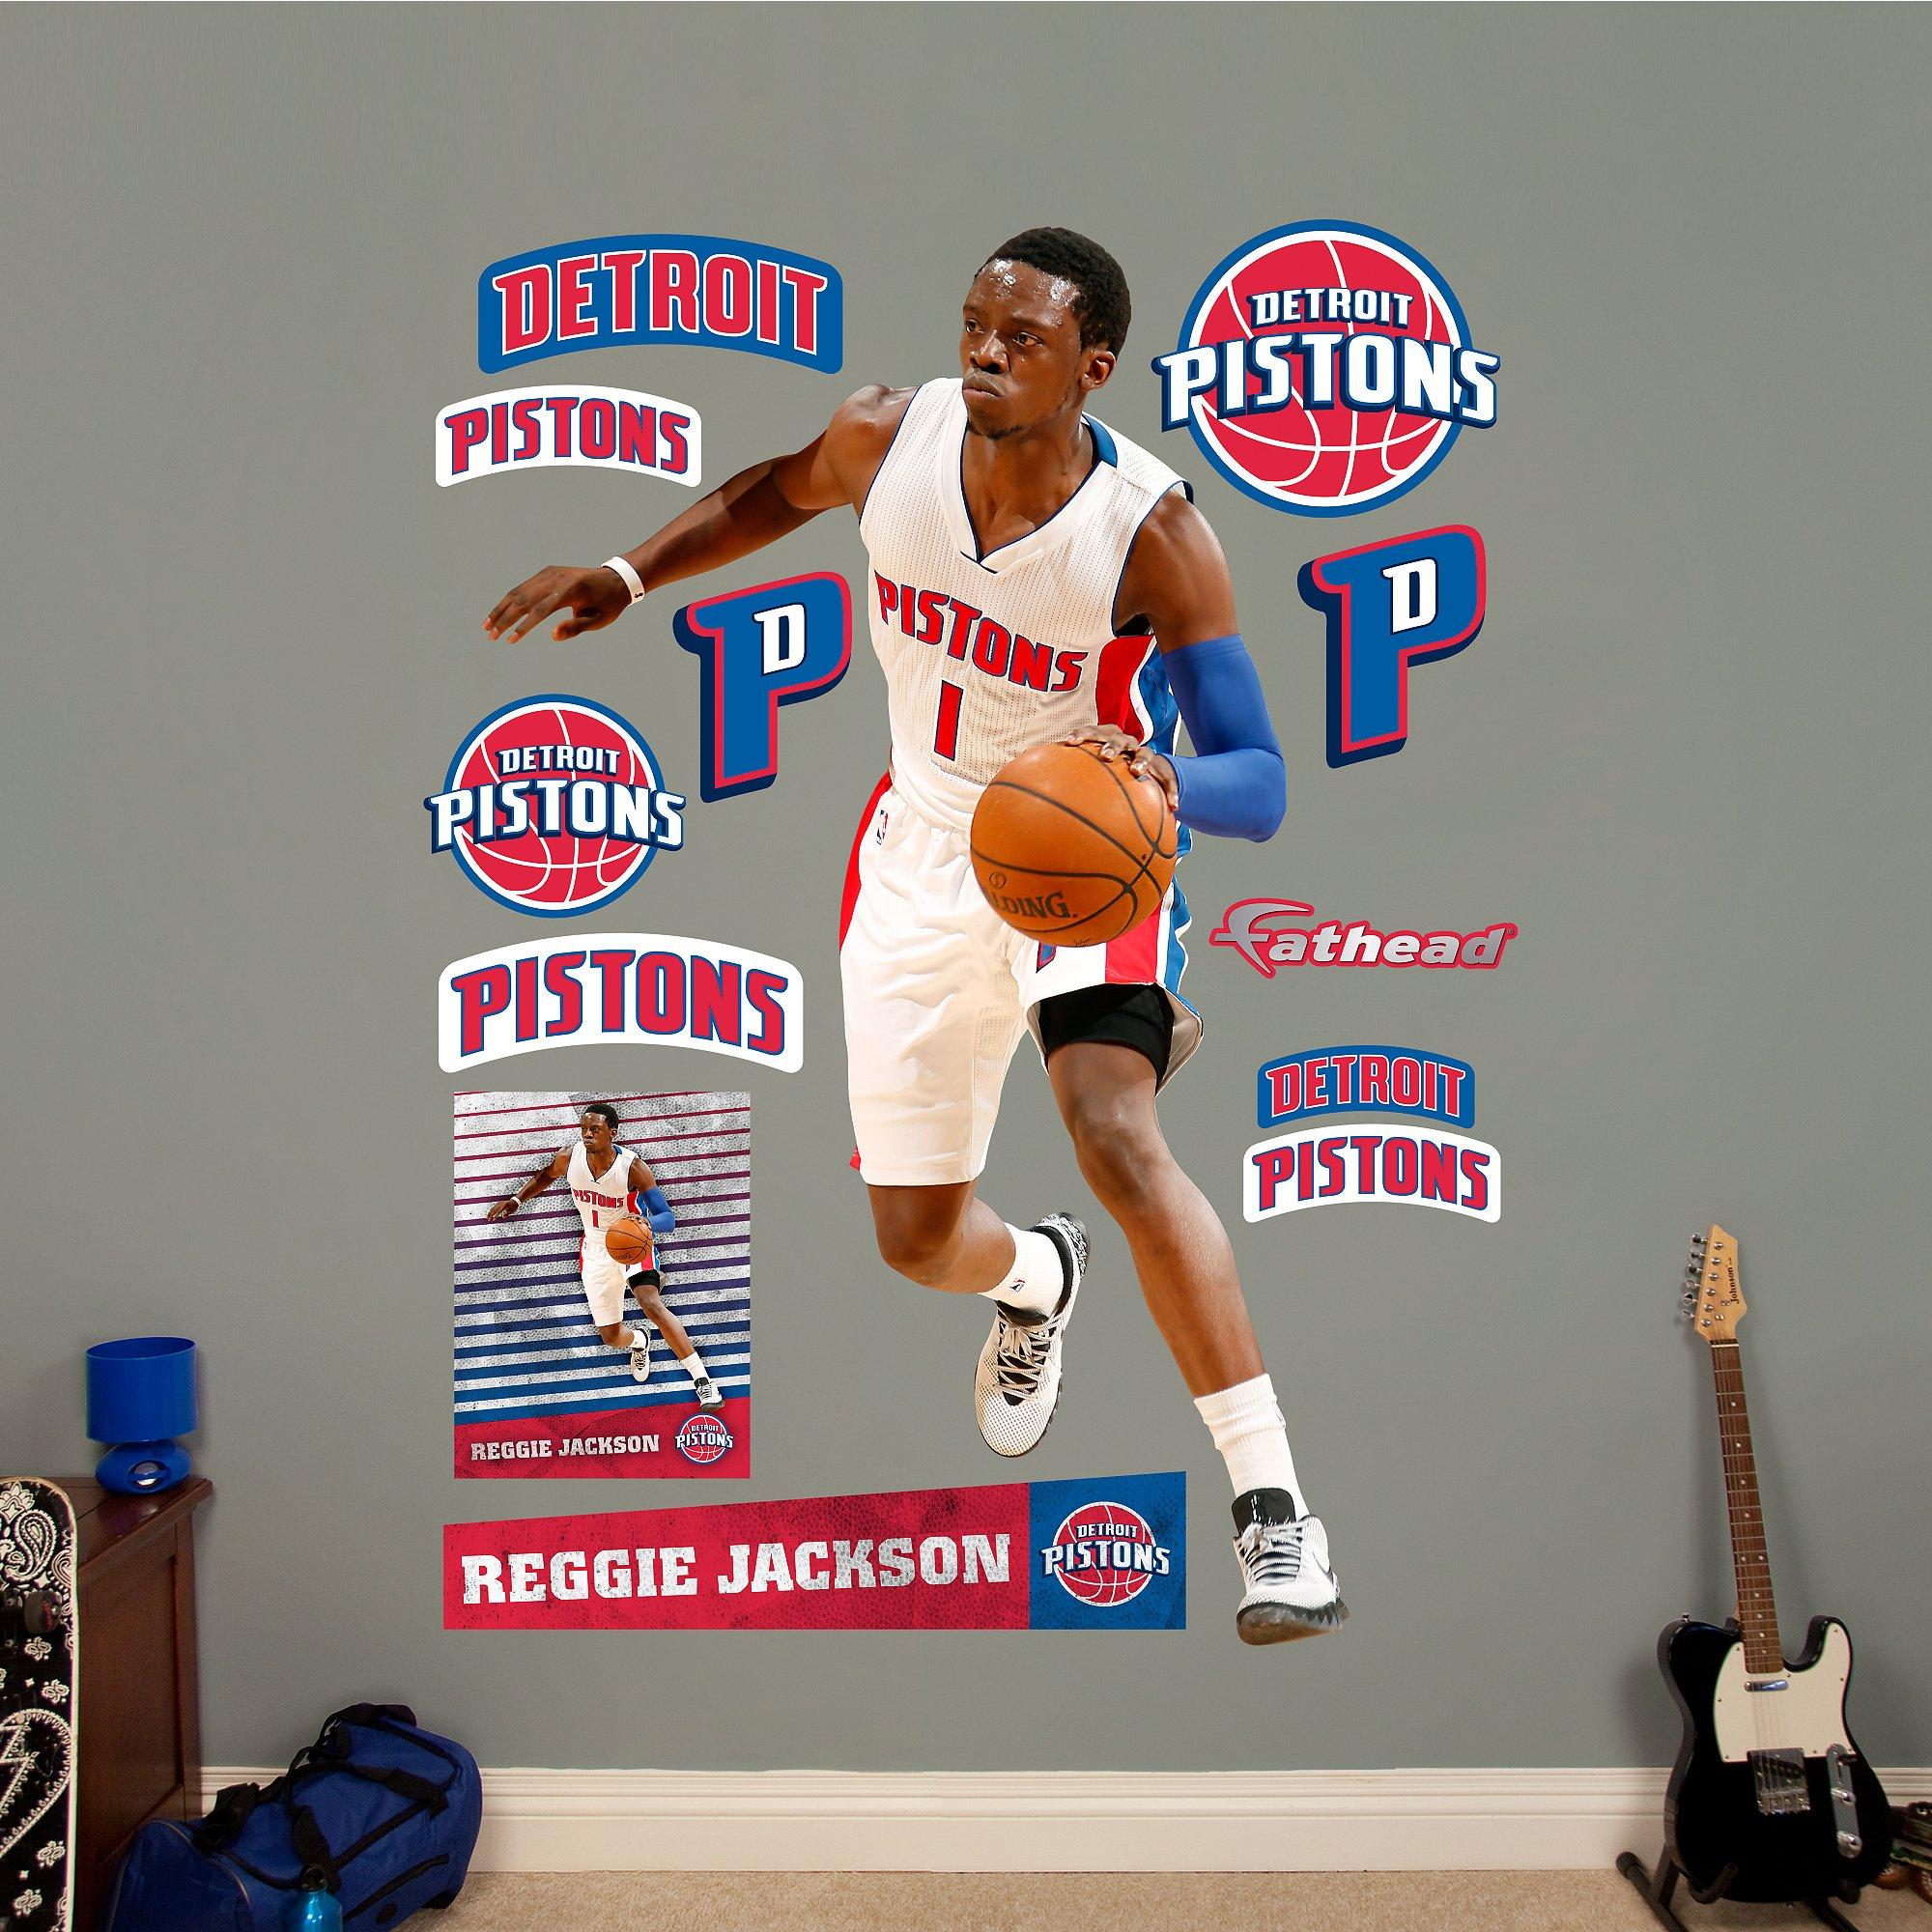 NBA Detroit Pistons Reggie Jackson Fathead Real Big Decals, 57''W x 74''H